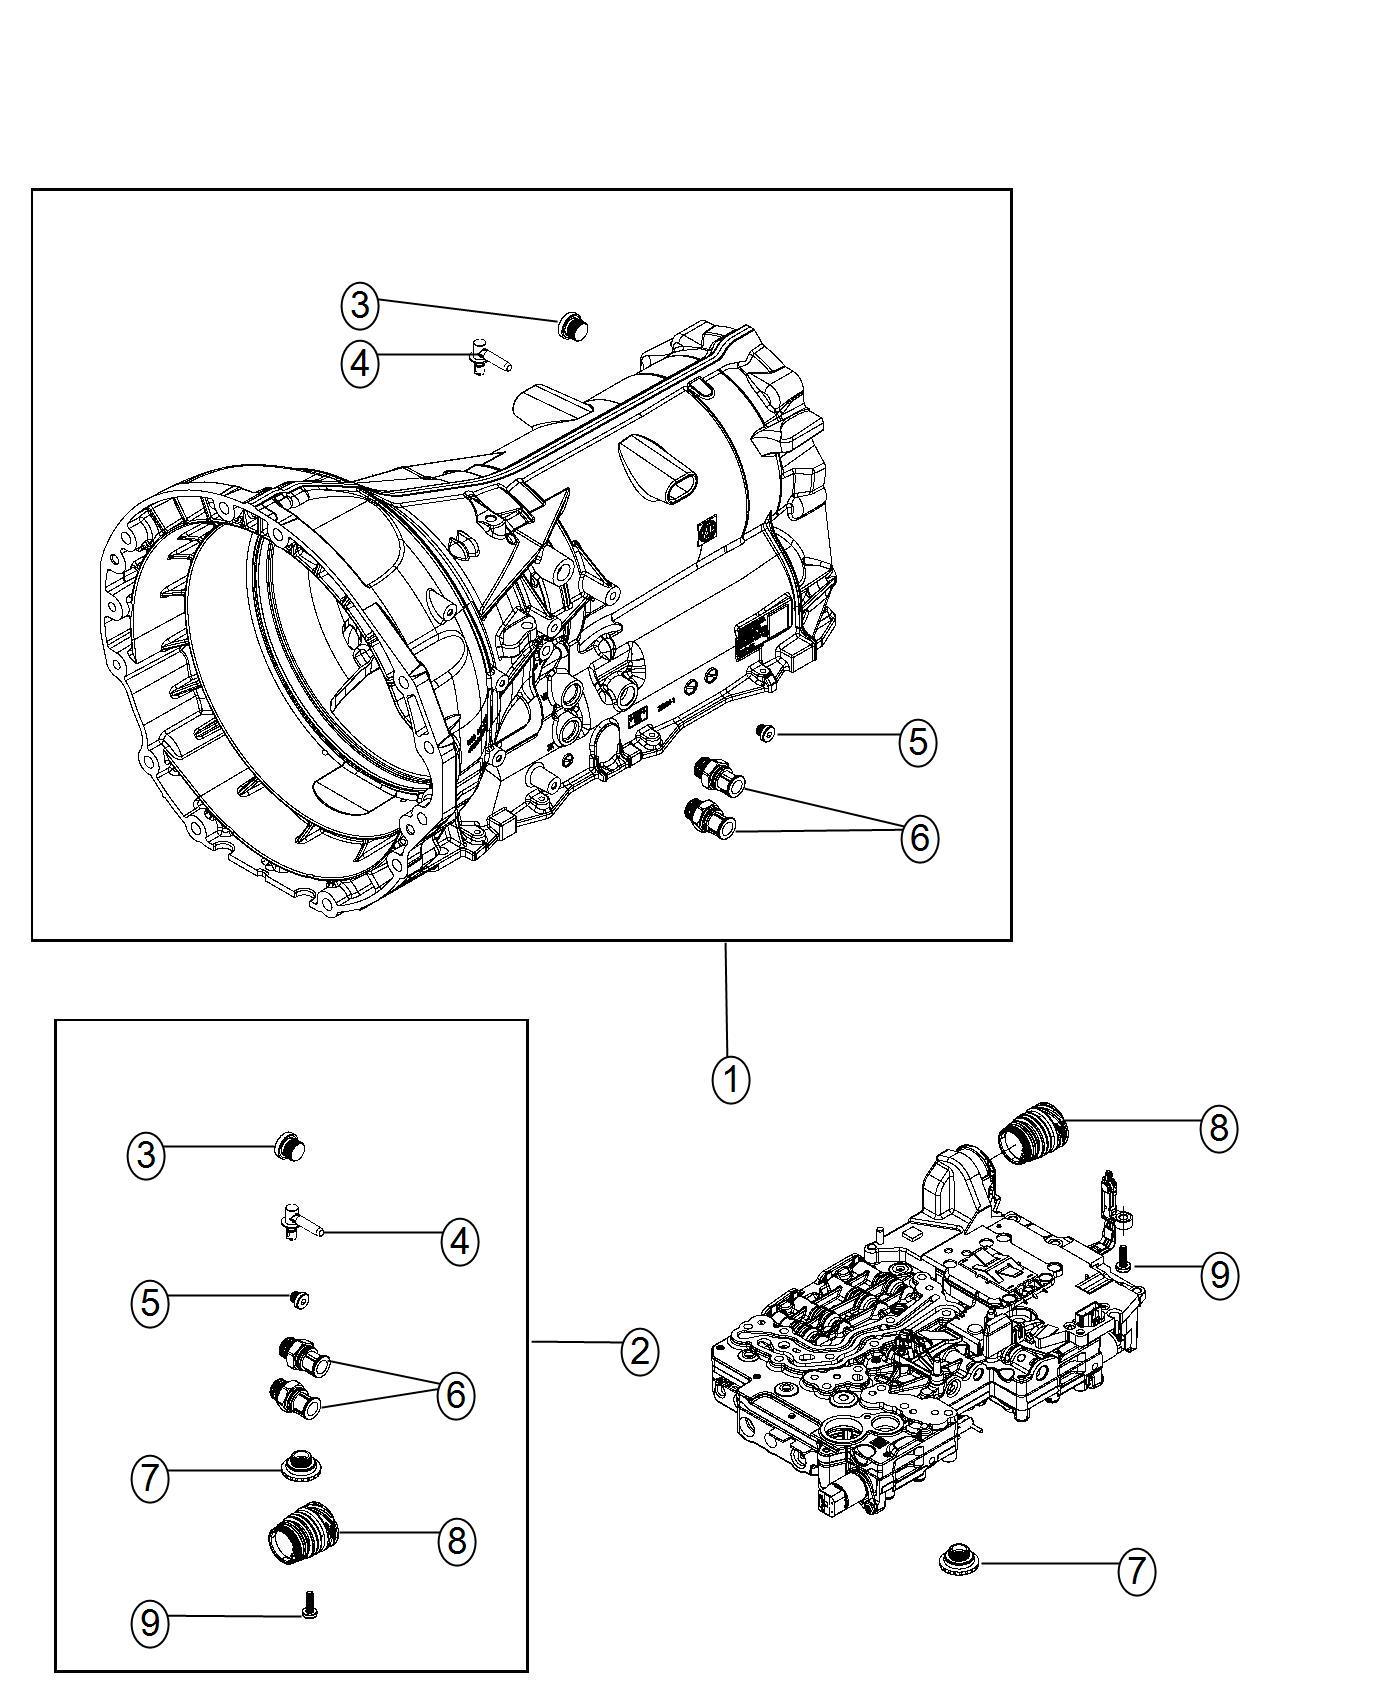 Dodge Durango Plug Oil Drain Equipment Group System